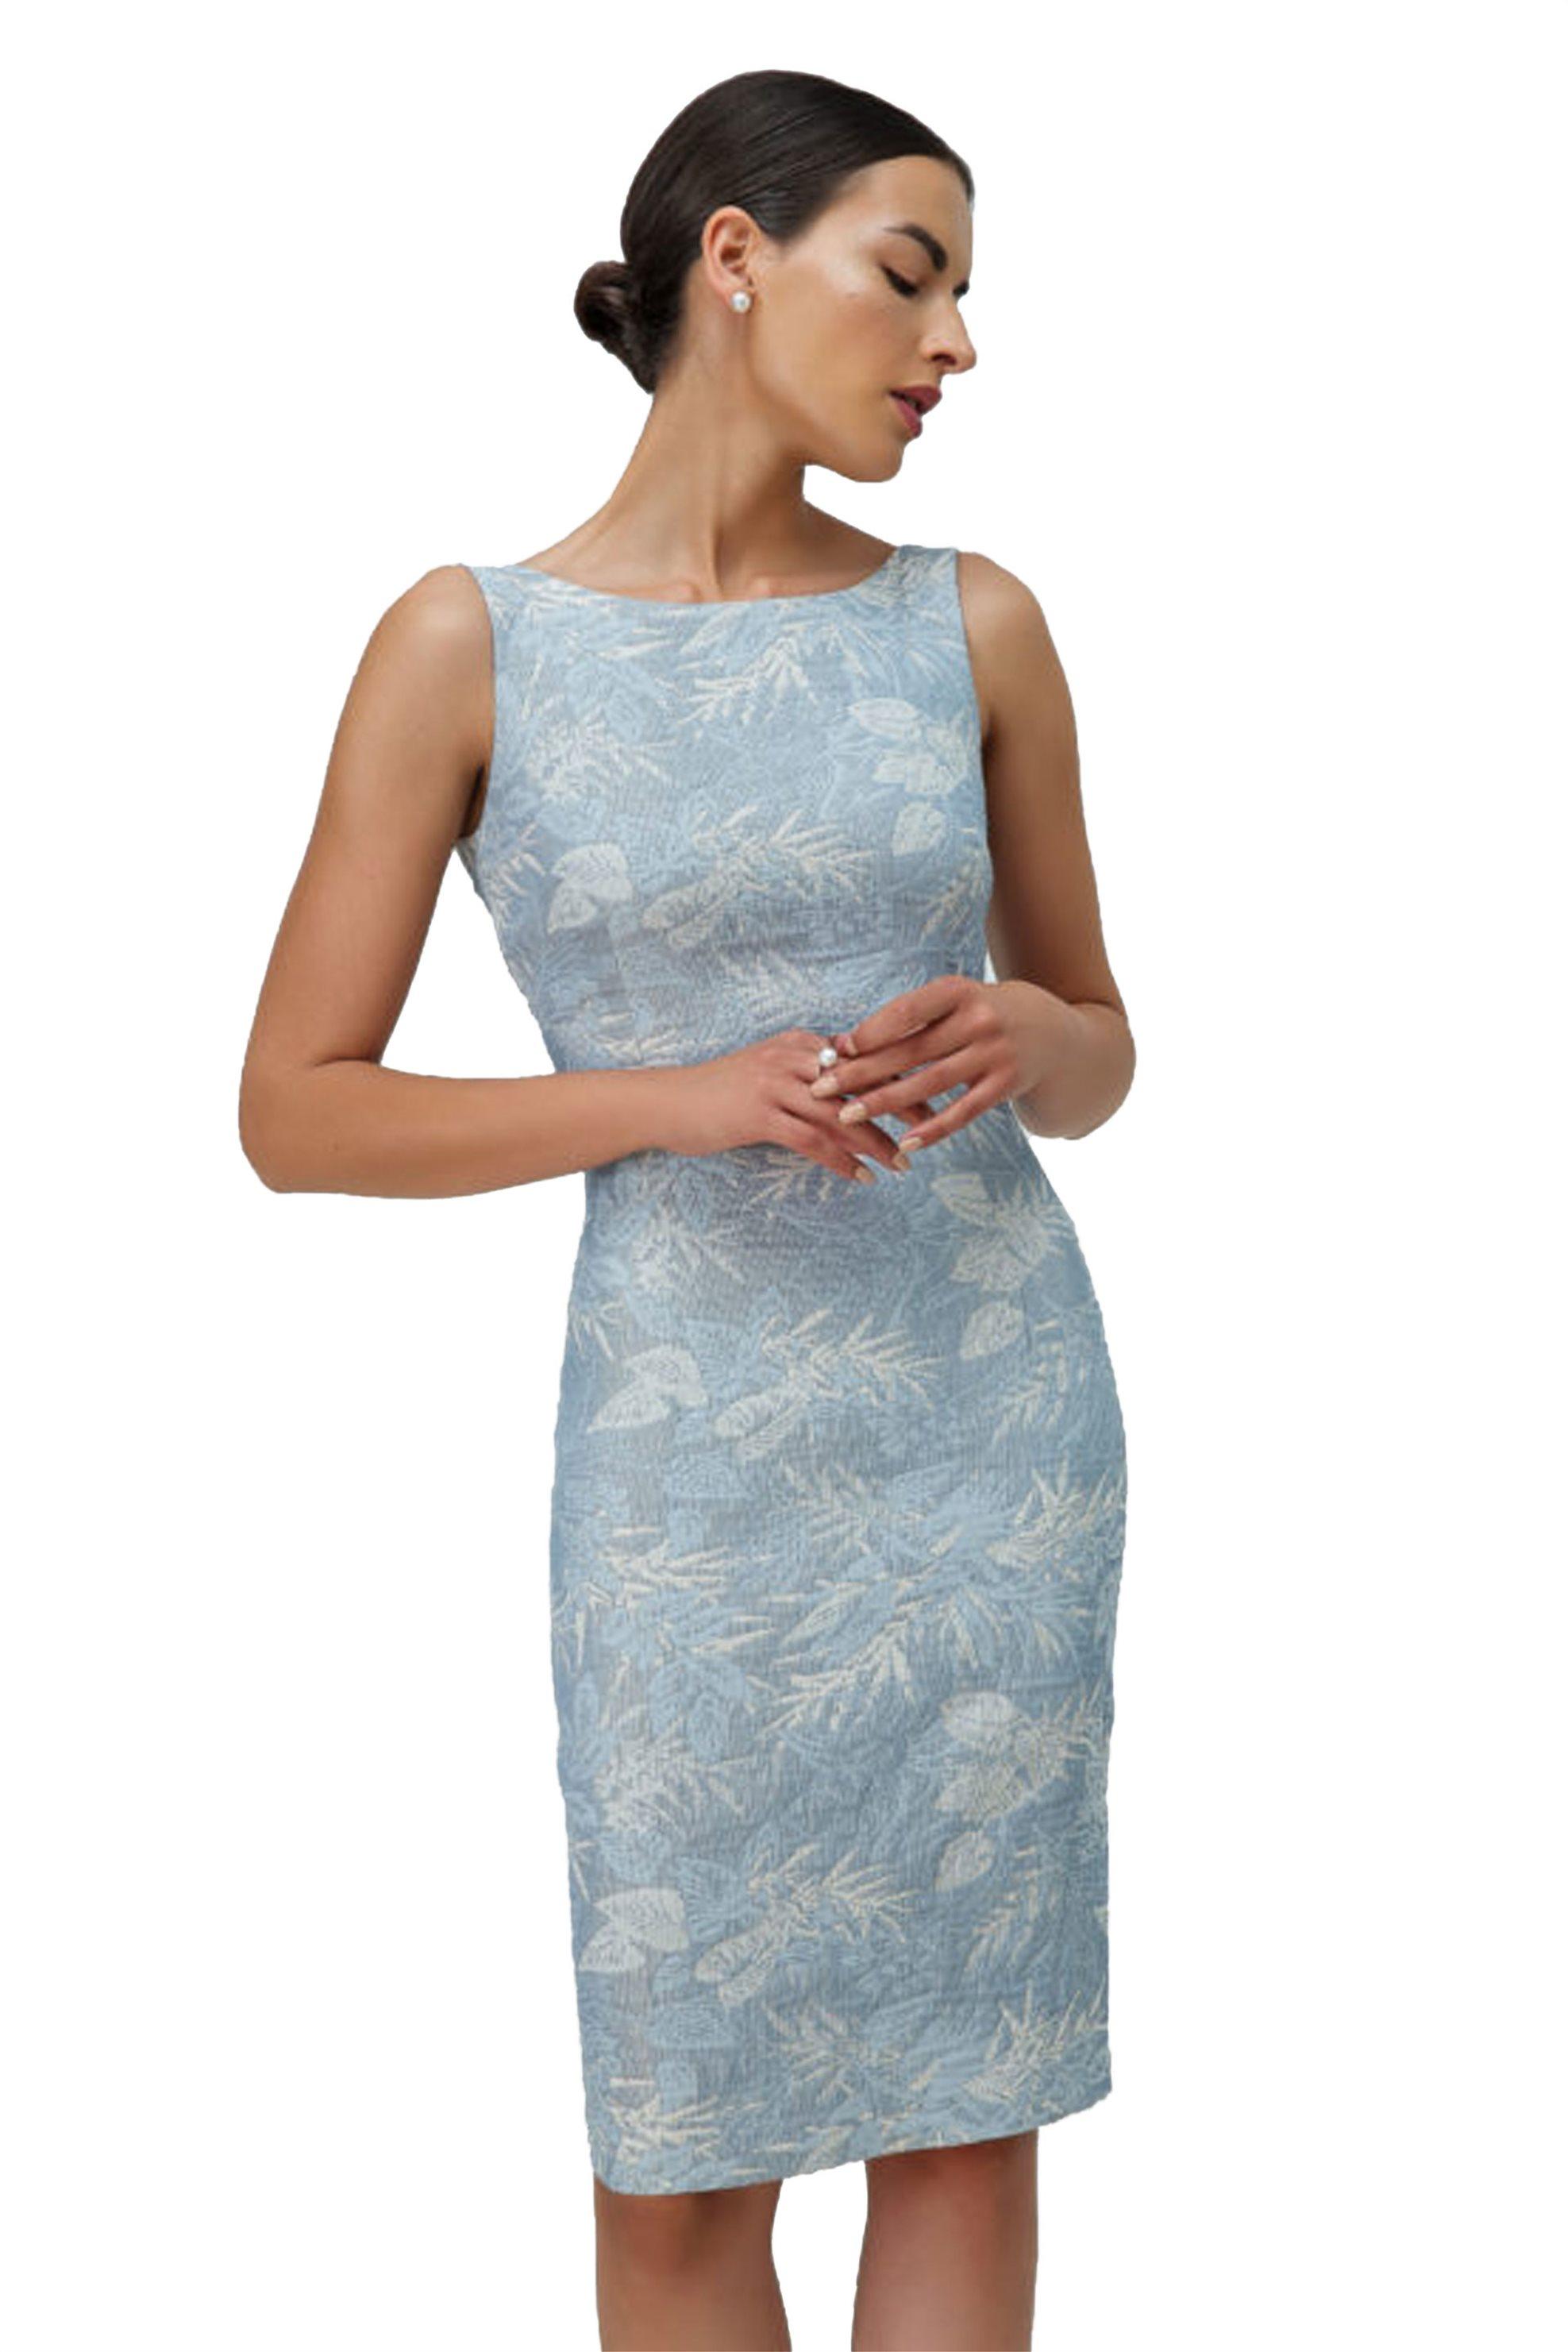 Billy Sabbado γυναικείο φόρεμα μίντι γαλάζιο αμάνικο - 0104930653 - Γαλάζιο γυναικα   ρουχα   φορέματα   midi φορέματα